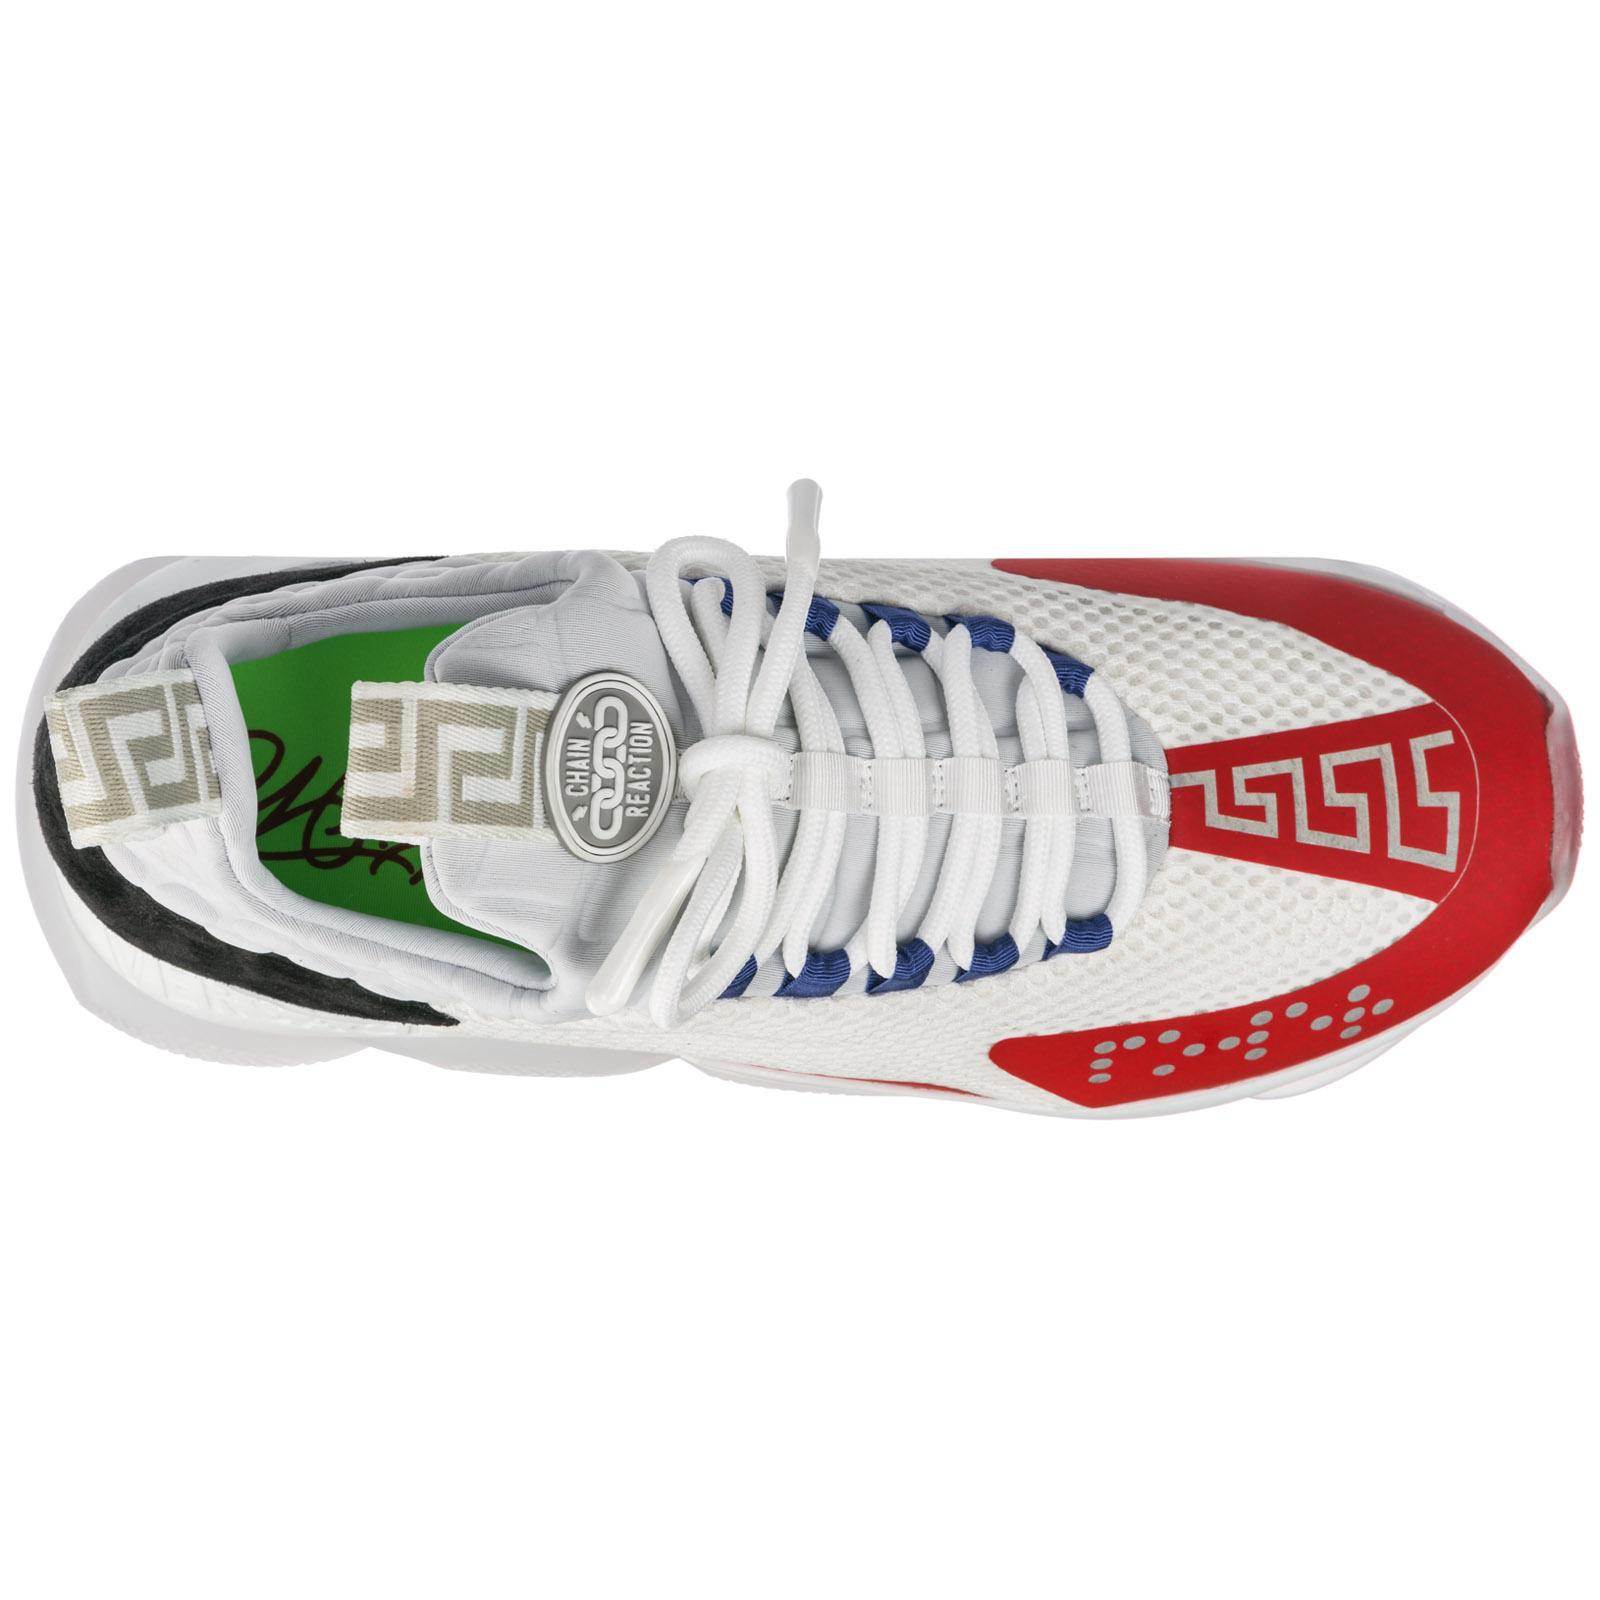 Sneakers Bianco D23tg Chainer Versace Cross Geranium Dsu7349 dwrn l1J5TFc3uK